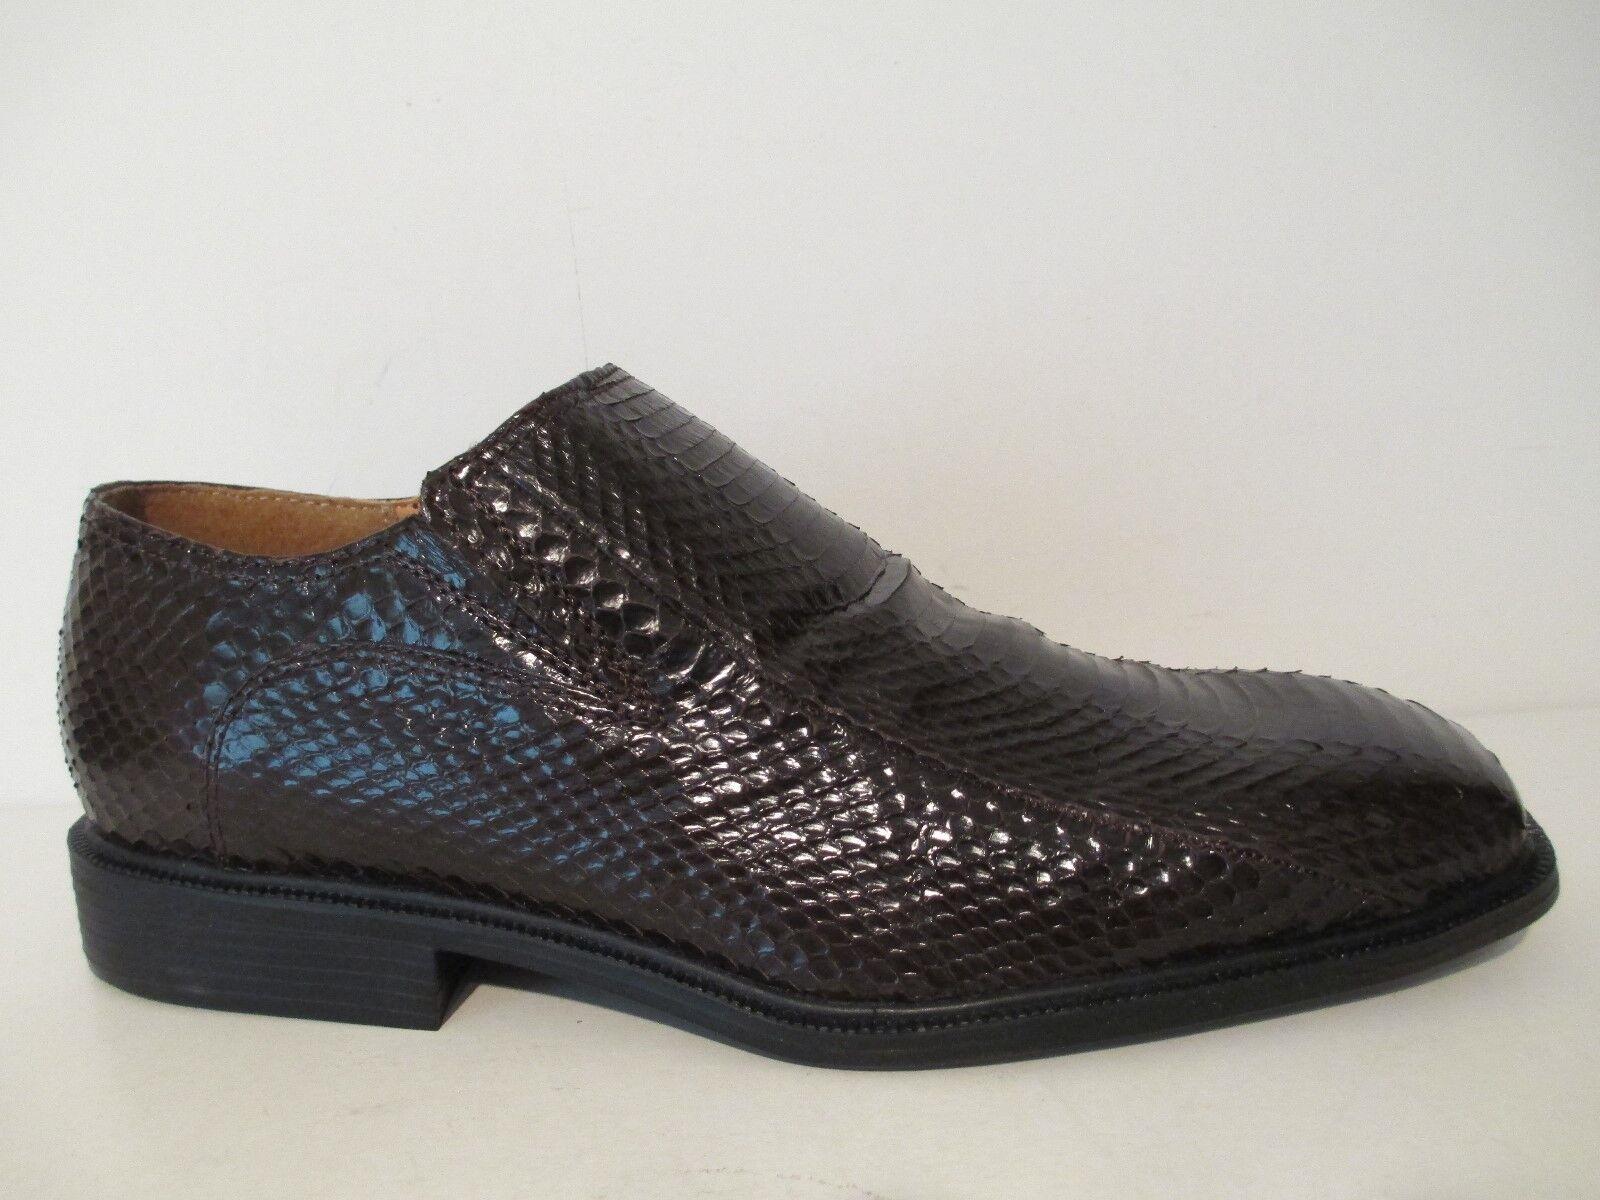 Giorgio Giorgio Giorgio Brutini Mens Felix 15521 Snakeskin Plain Toe Slip On Loafer braun 9 15 e4bbcd